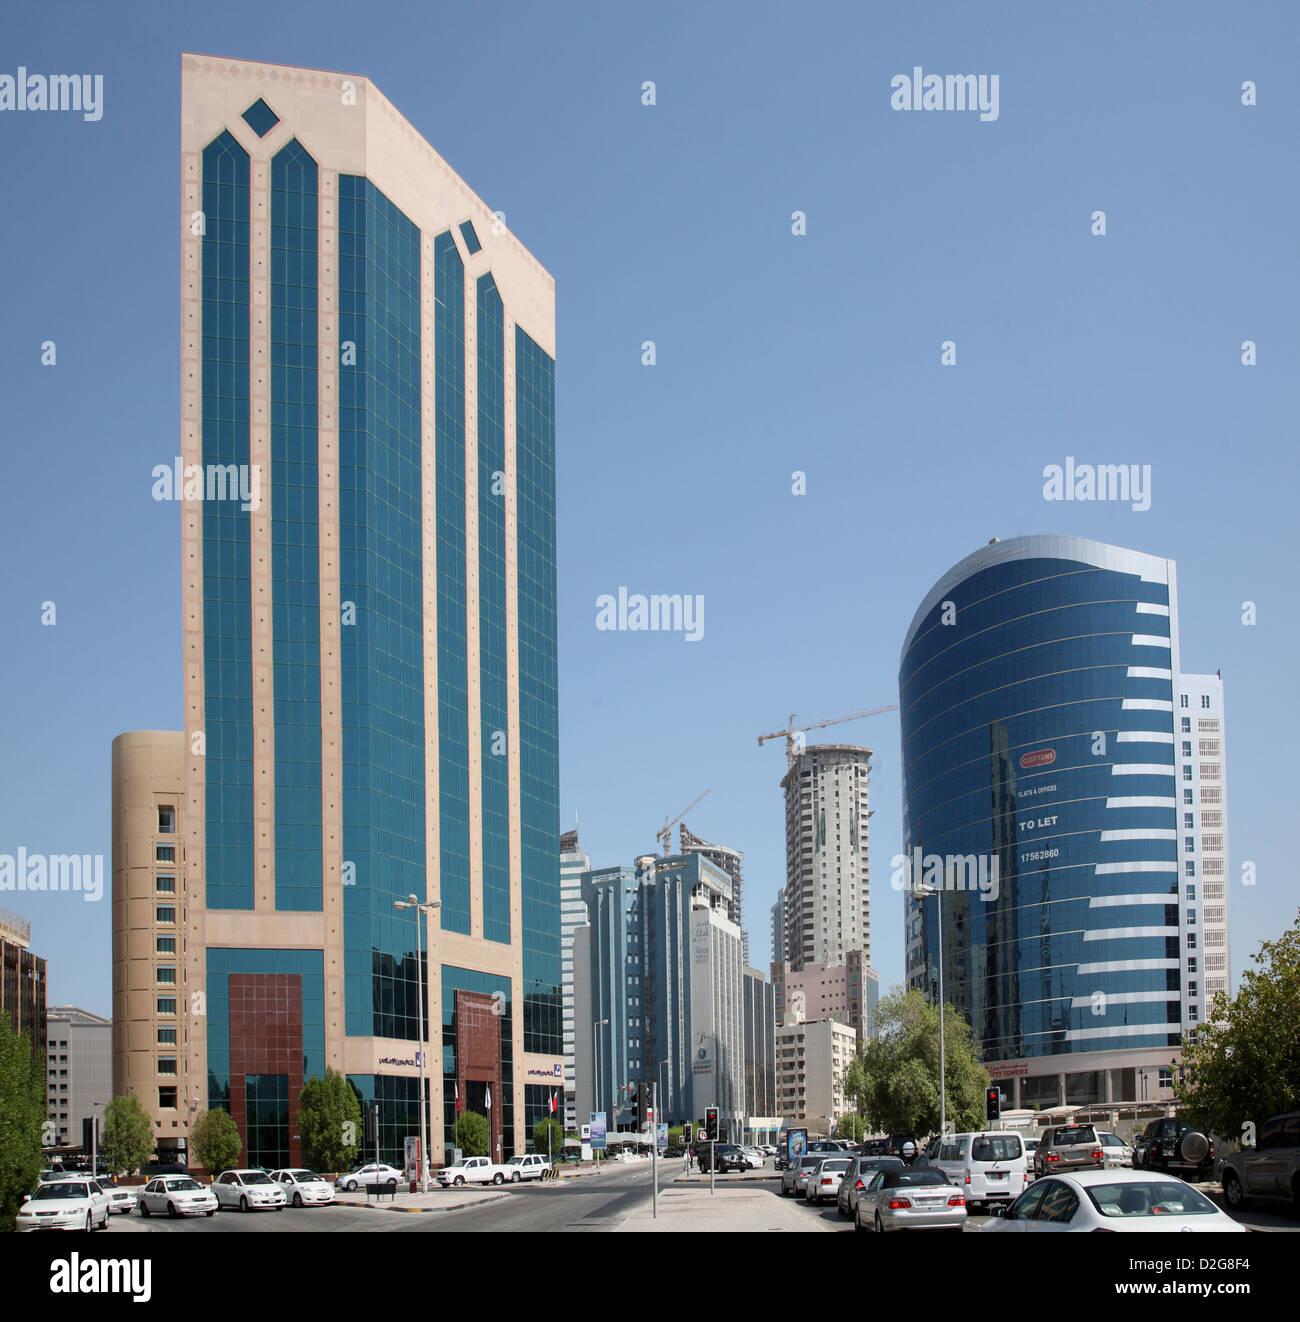 Manama, Bahrain. Looking east along Government Avenue towards the Diplomatic Area - Stock Image